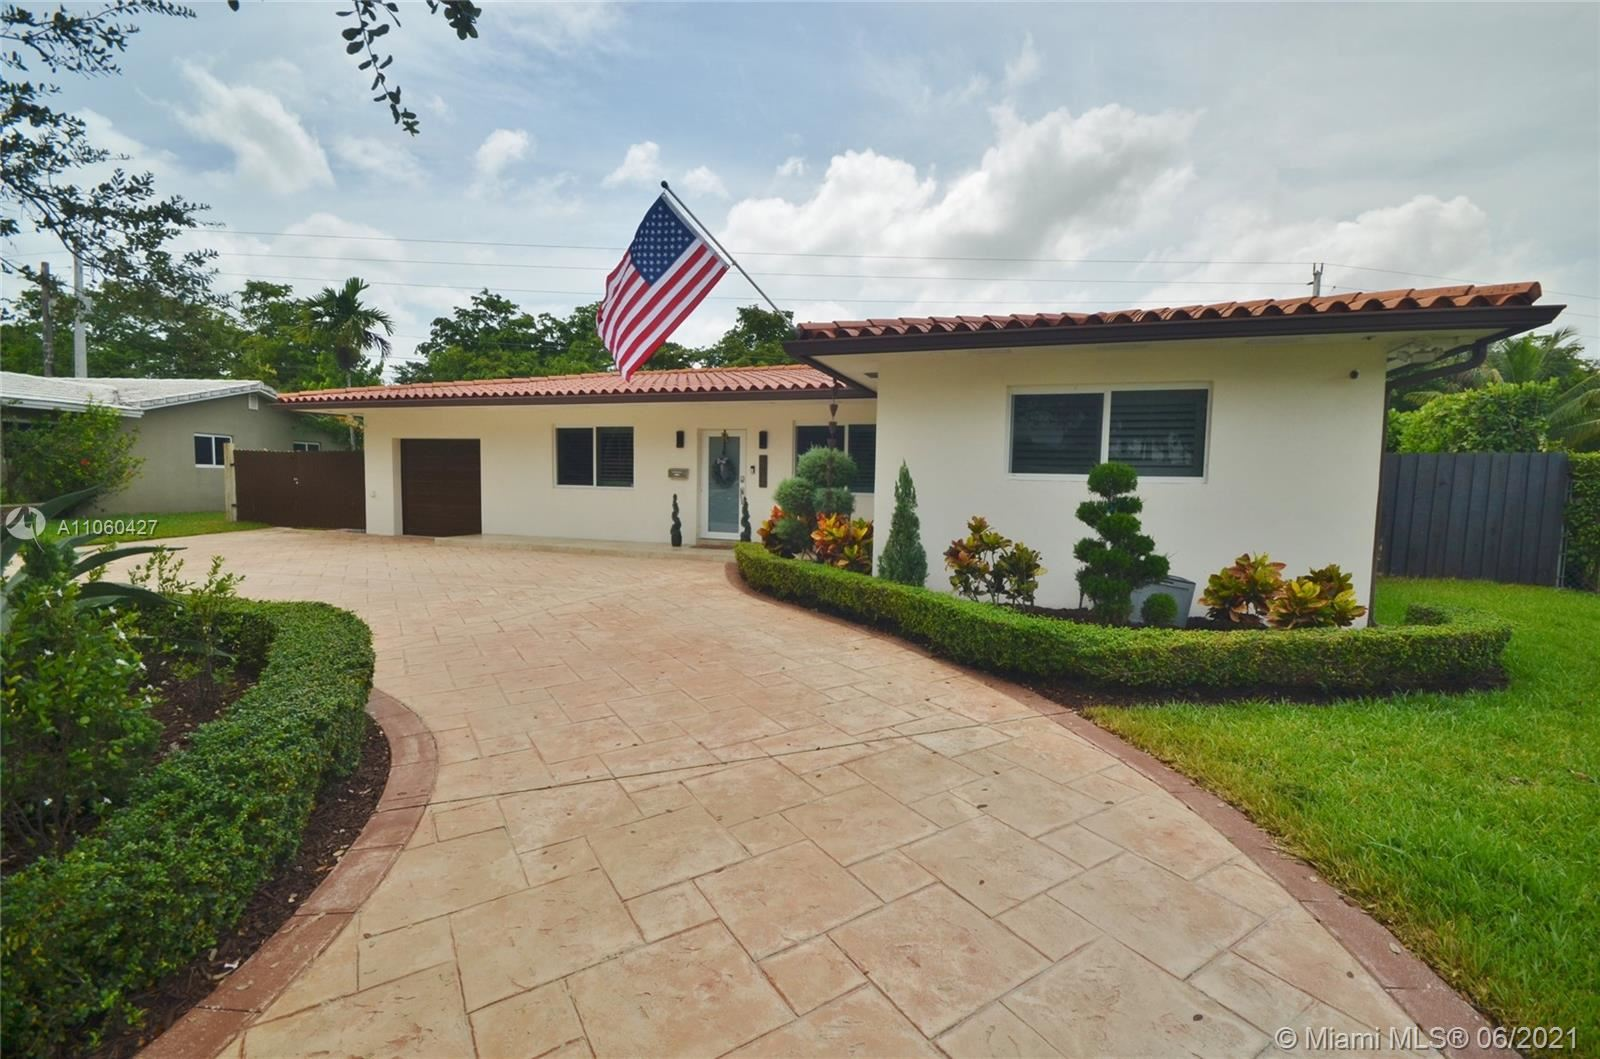 6772 Parkinsonia Dr, Miami Lakes, FL 33014 - #: A11060427